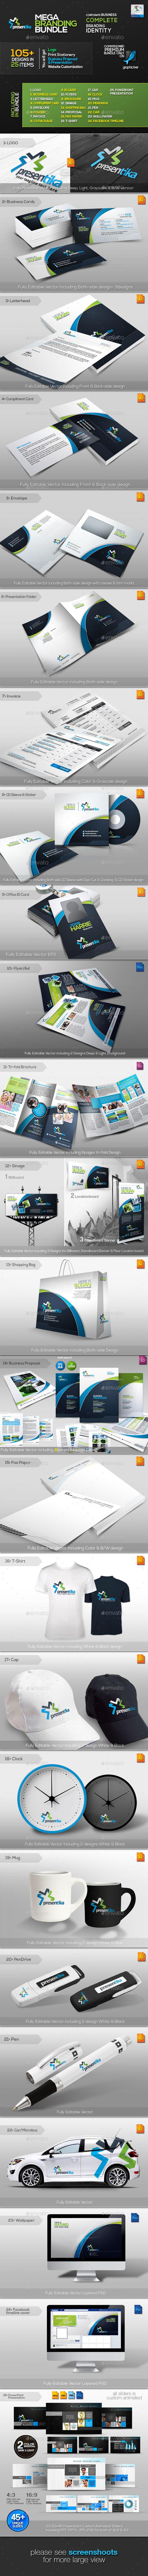 Presentica: Business Identity Mega Branding Bundle - Stationery Print Templates